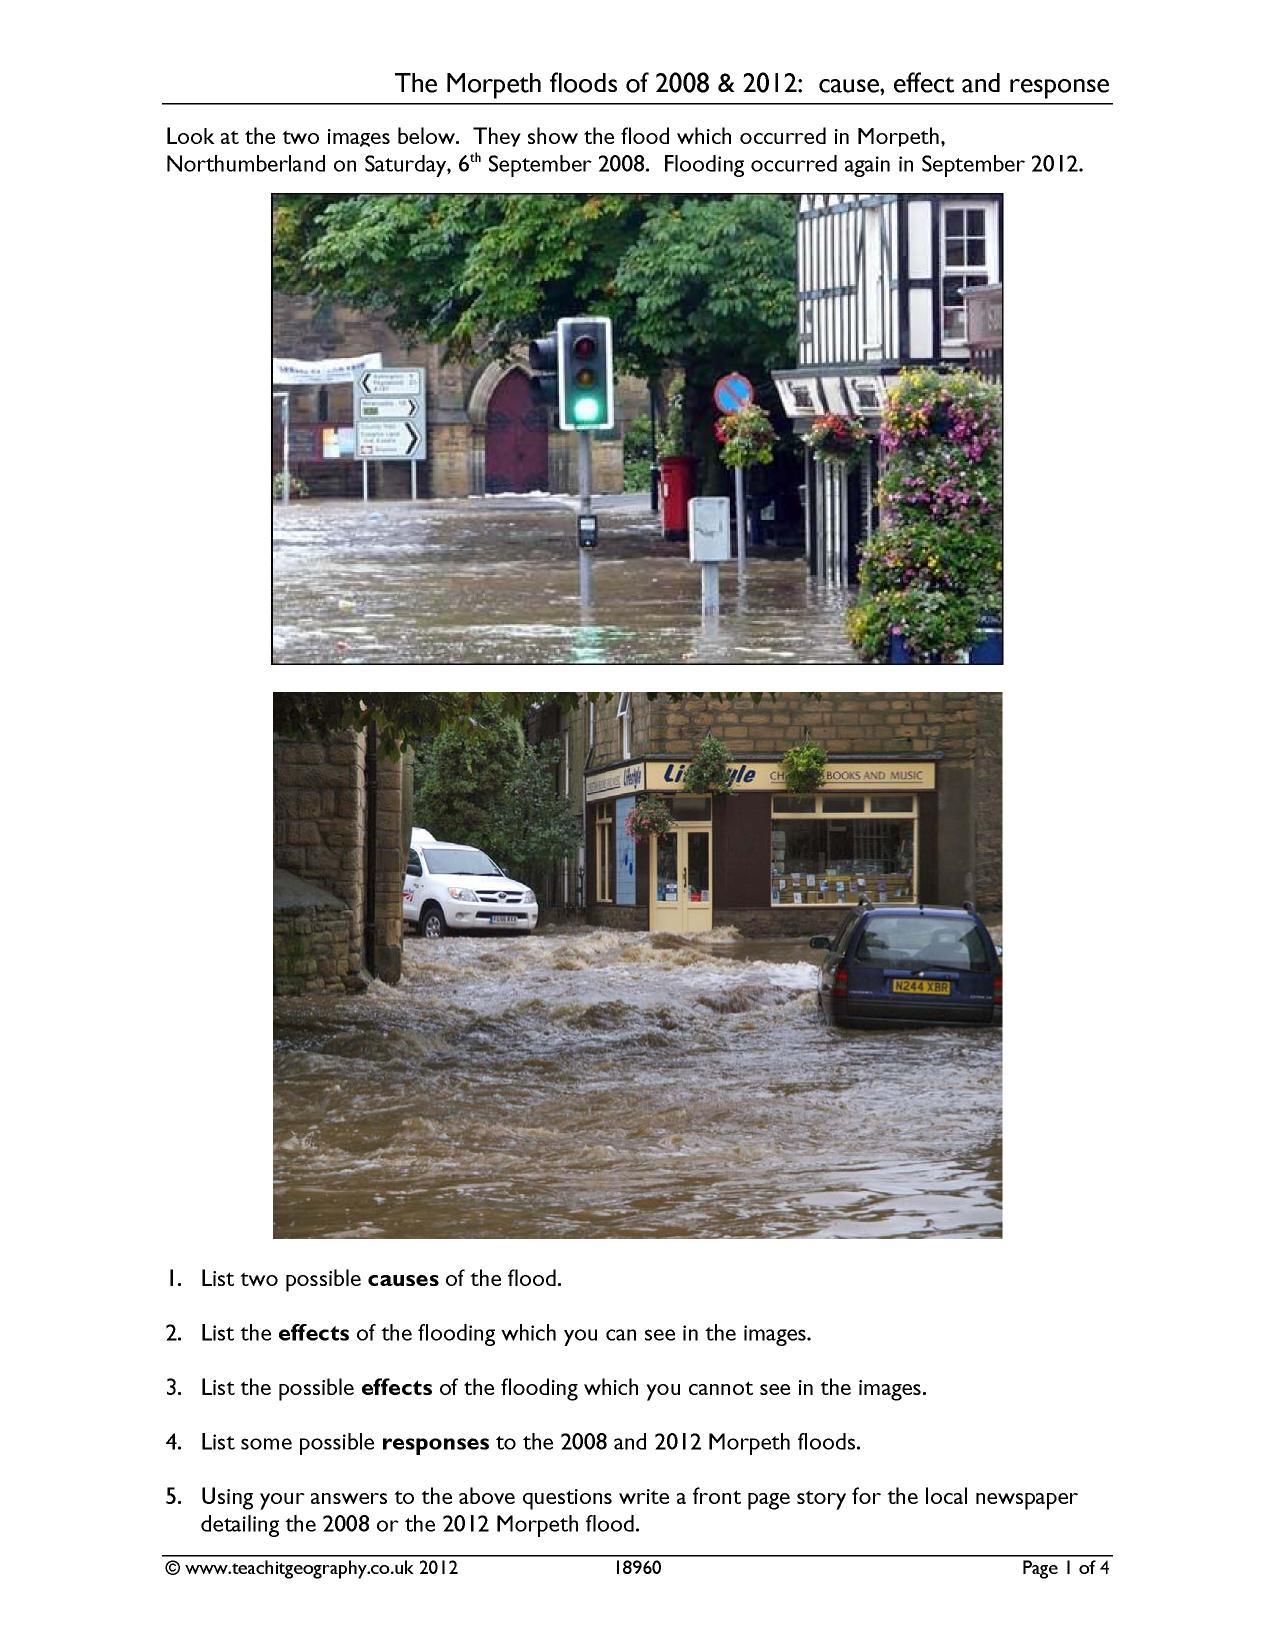 The boscastle flood (August 2004) - case study - SlideShare